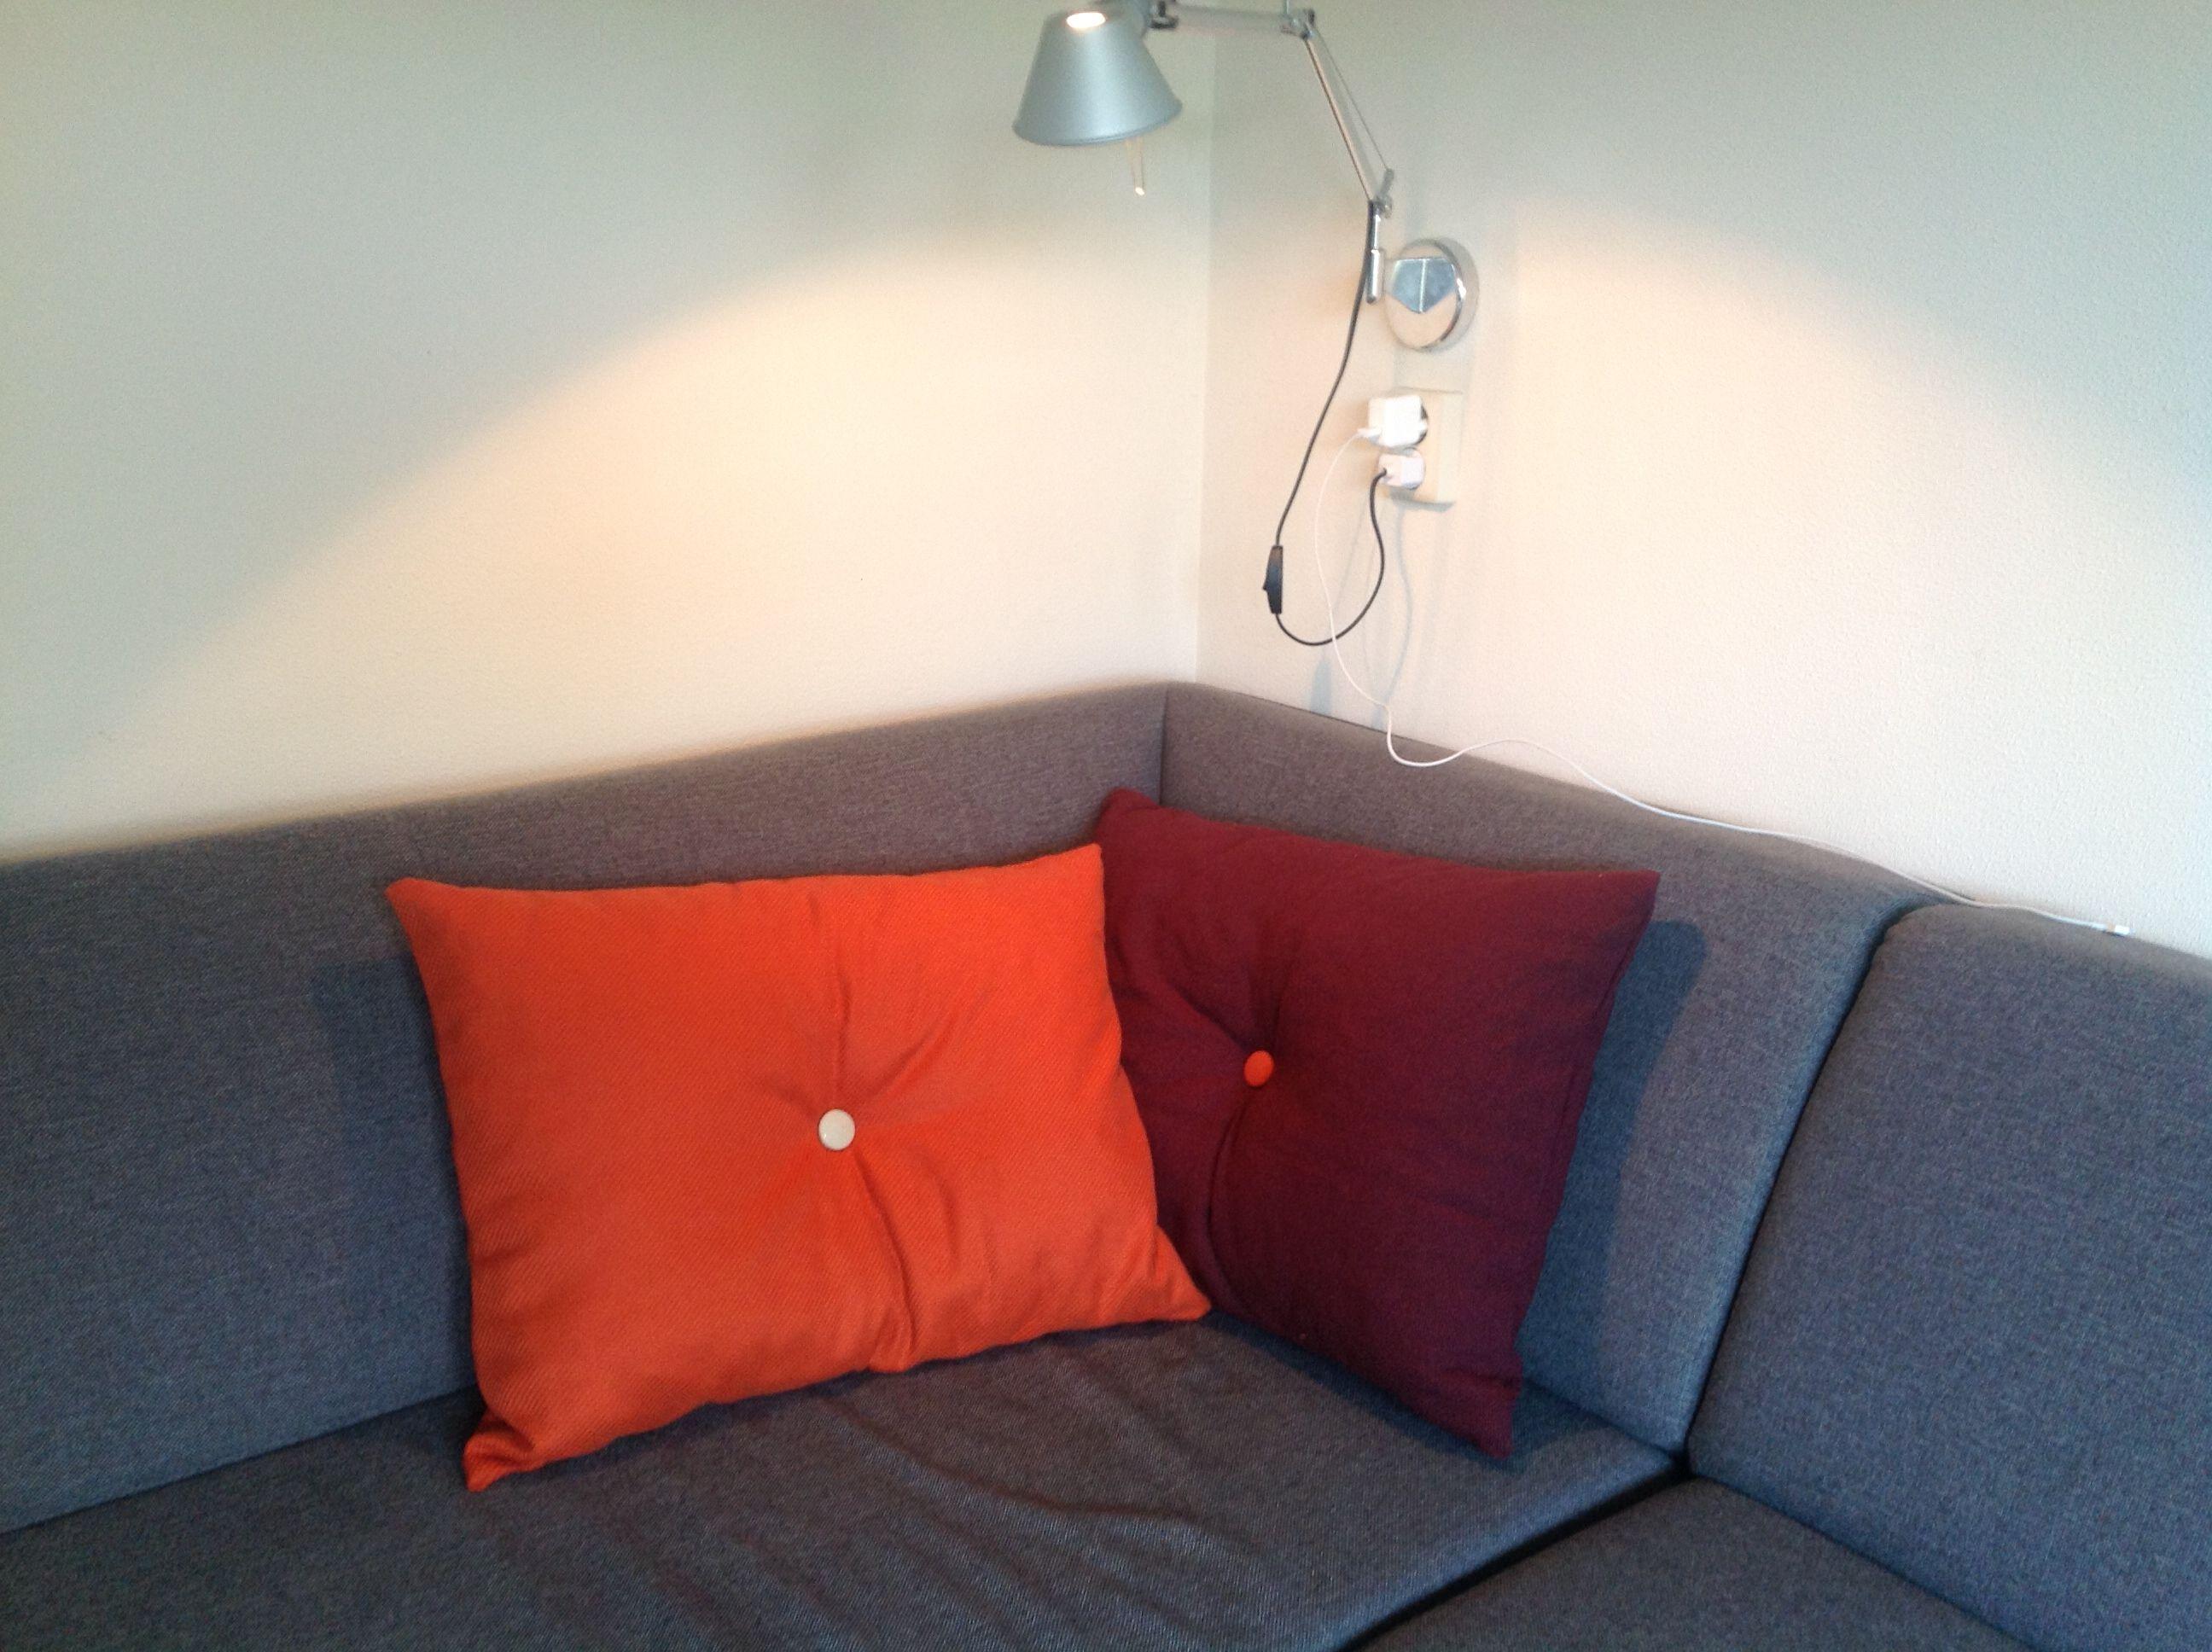 Homemade cushions diy stuff pinterest crafts